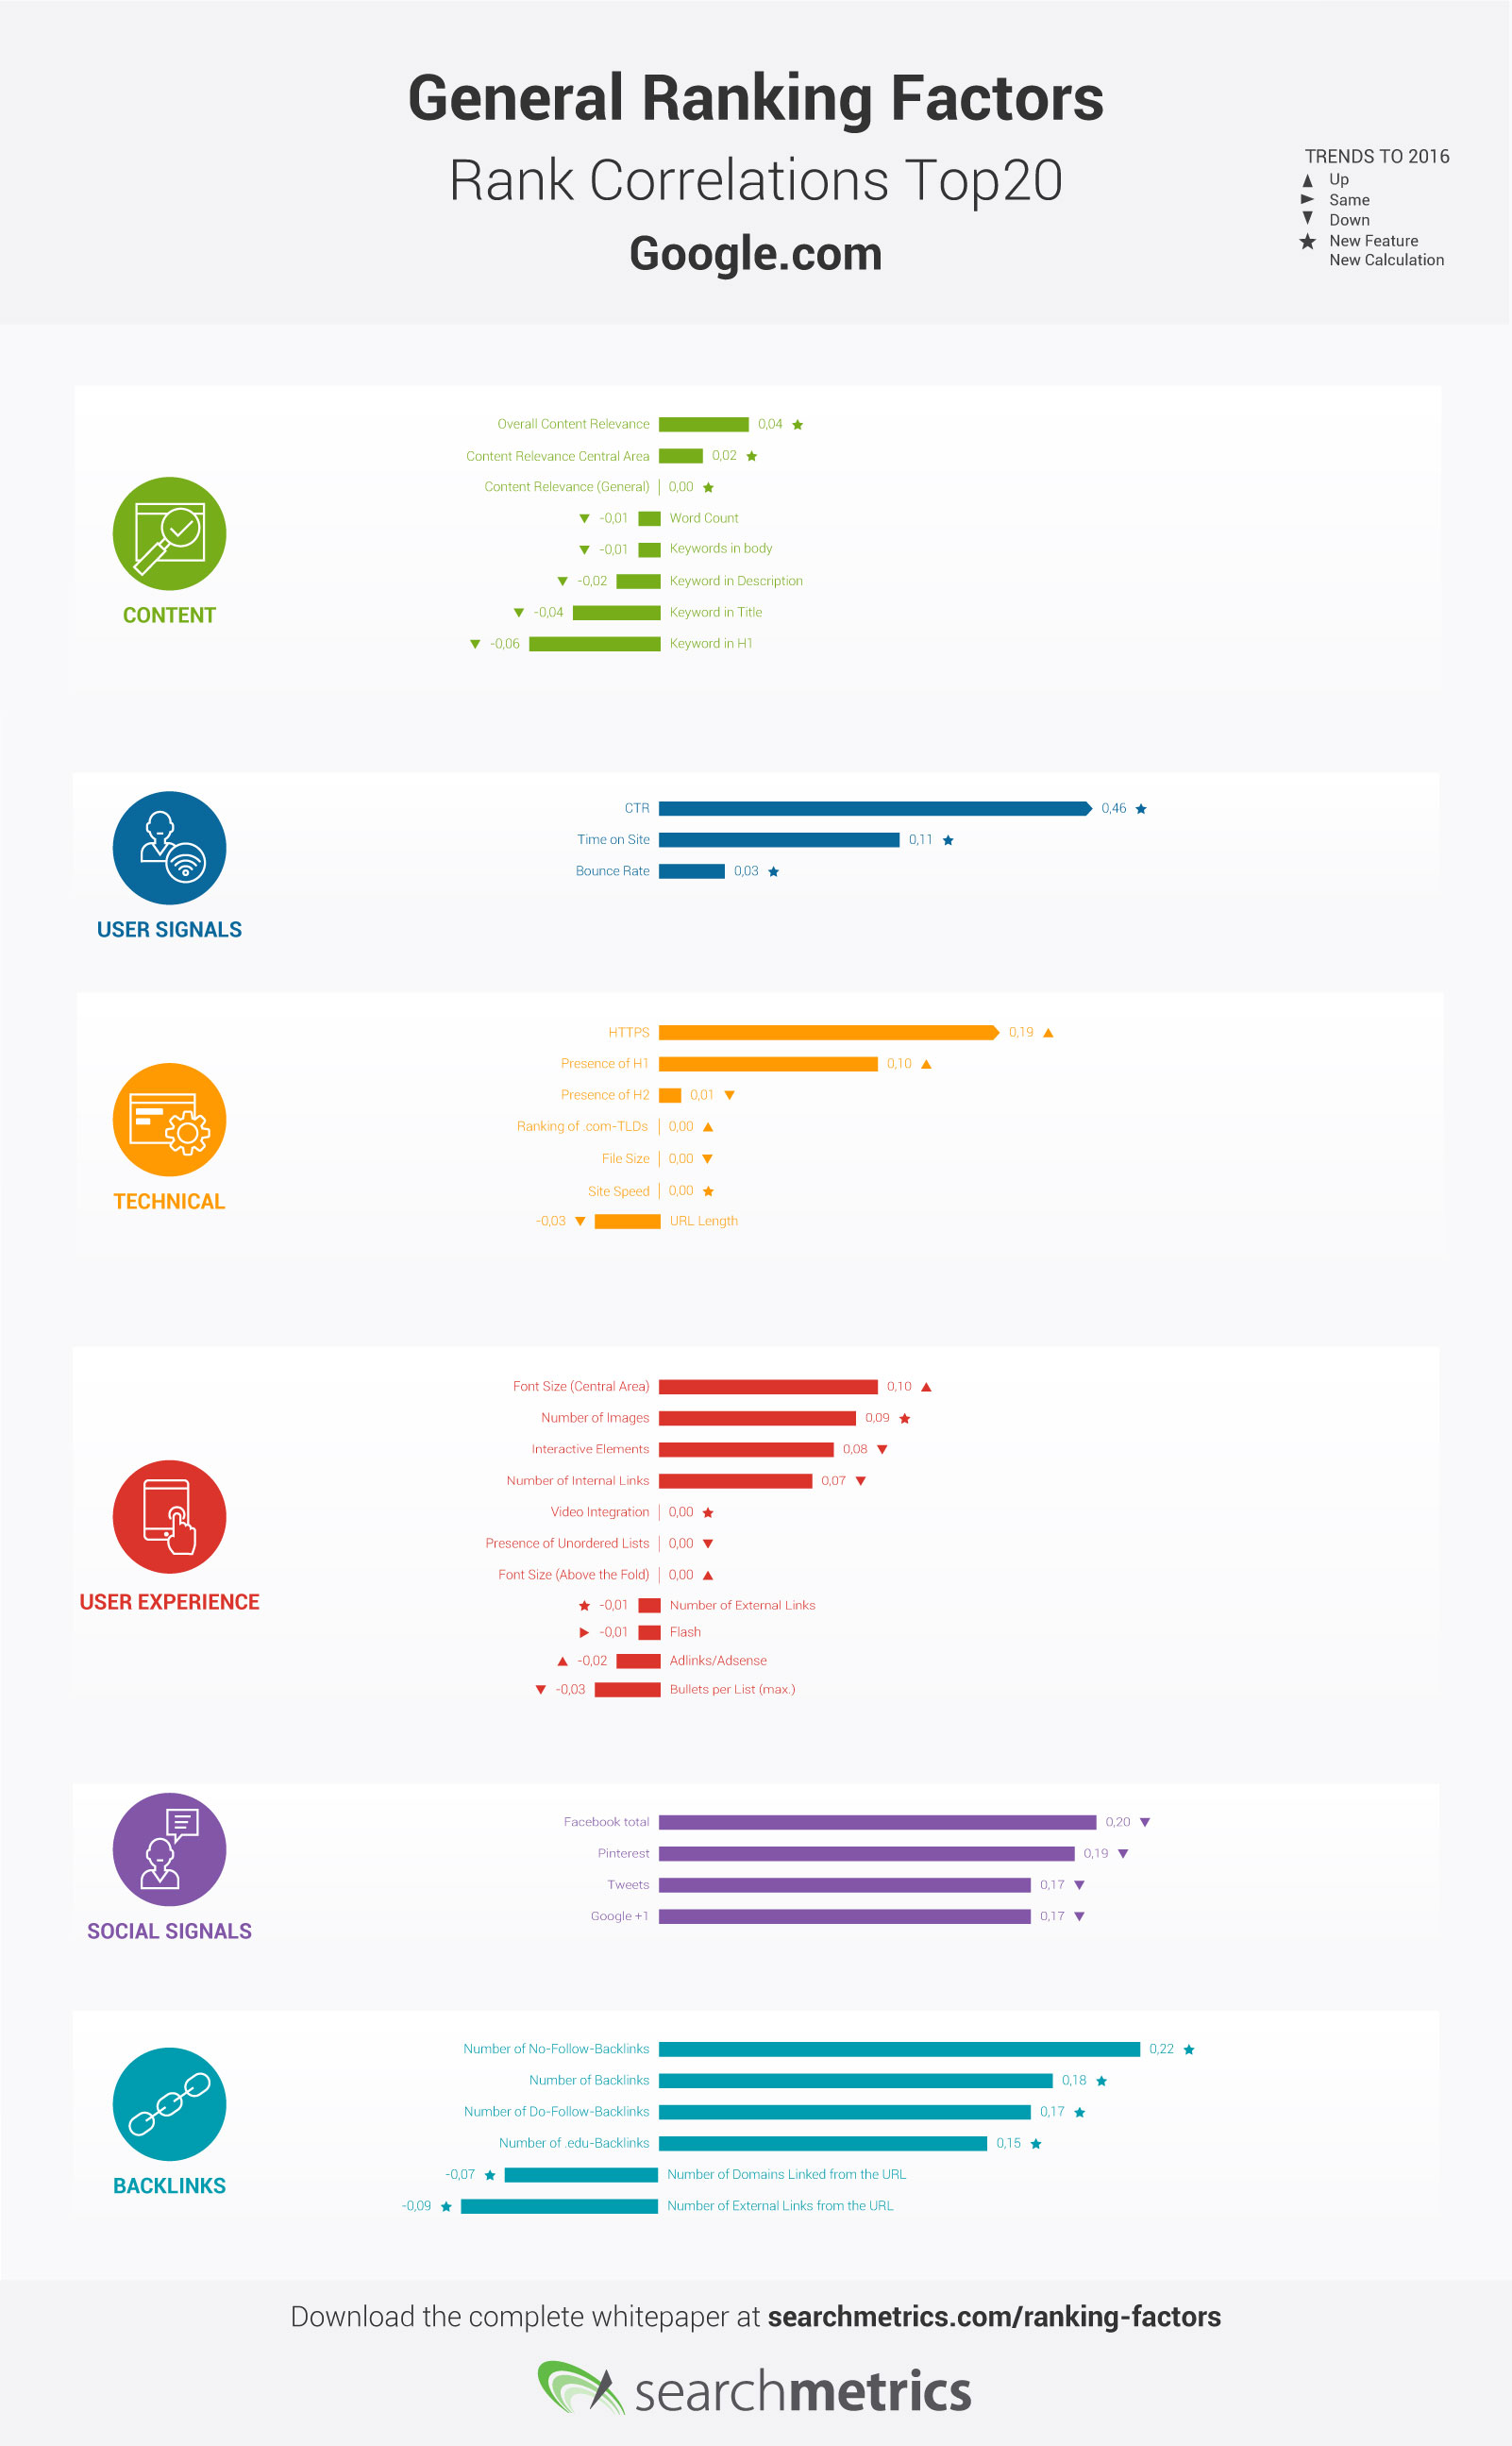 Searchmetrics Ranking Factors Infographic